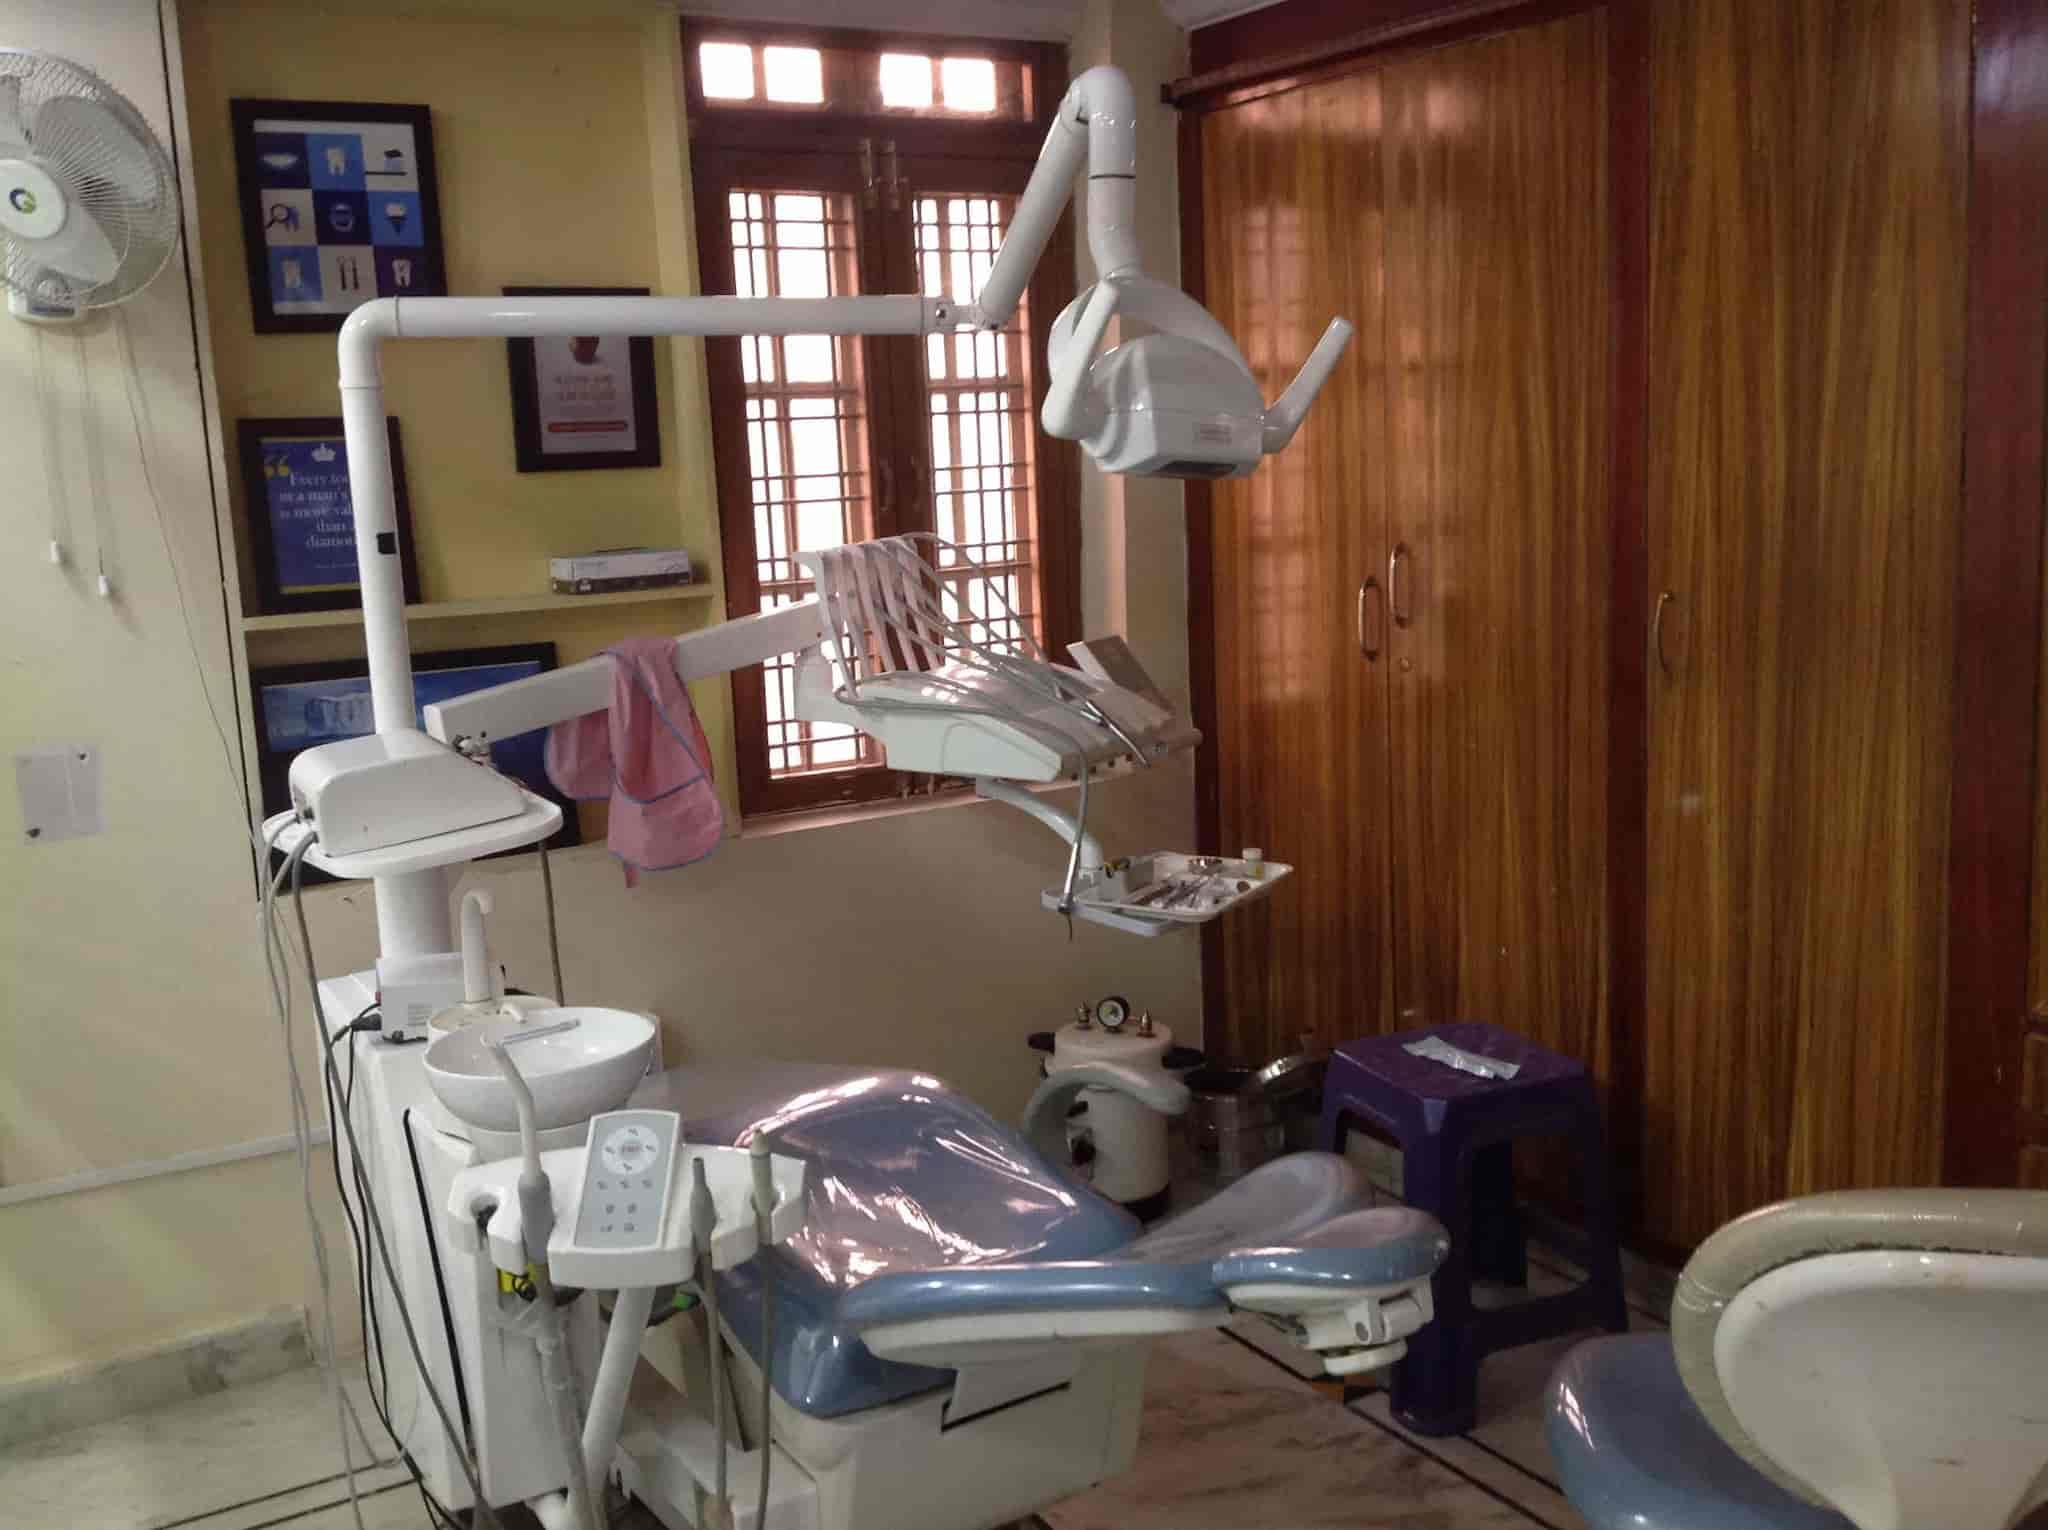 Hill Fort Dental Smile Centre Photos, Bowenpally, Hyderabad